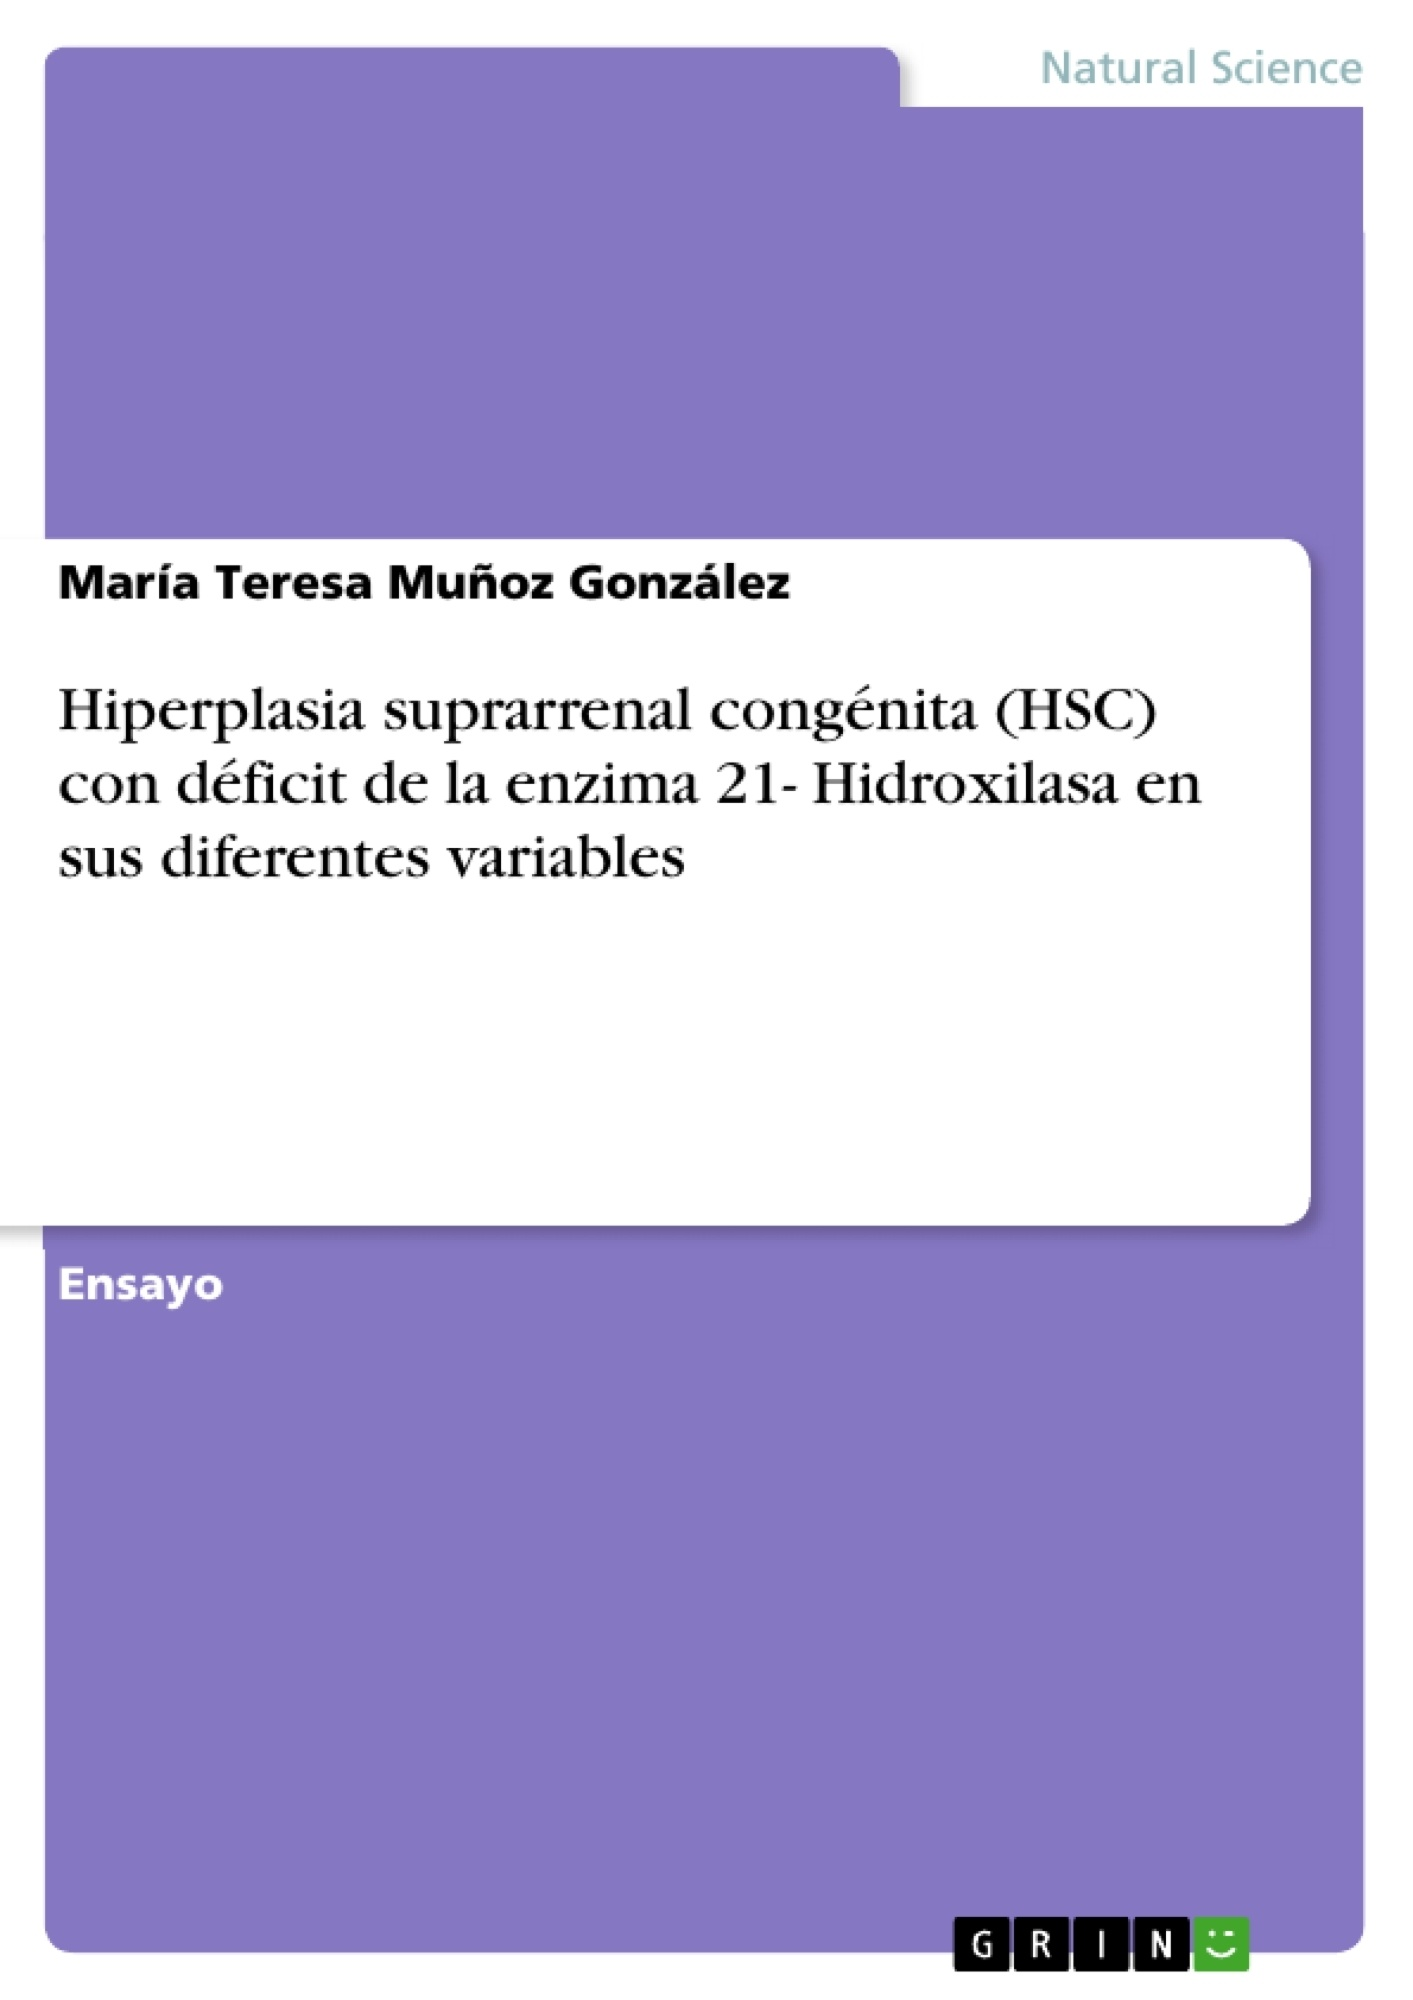 Título: Hiperplasia suprarrenal congénita (HSC)  con déficit de la enzima 21- Hidroxilasa en sus diferentes variables